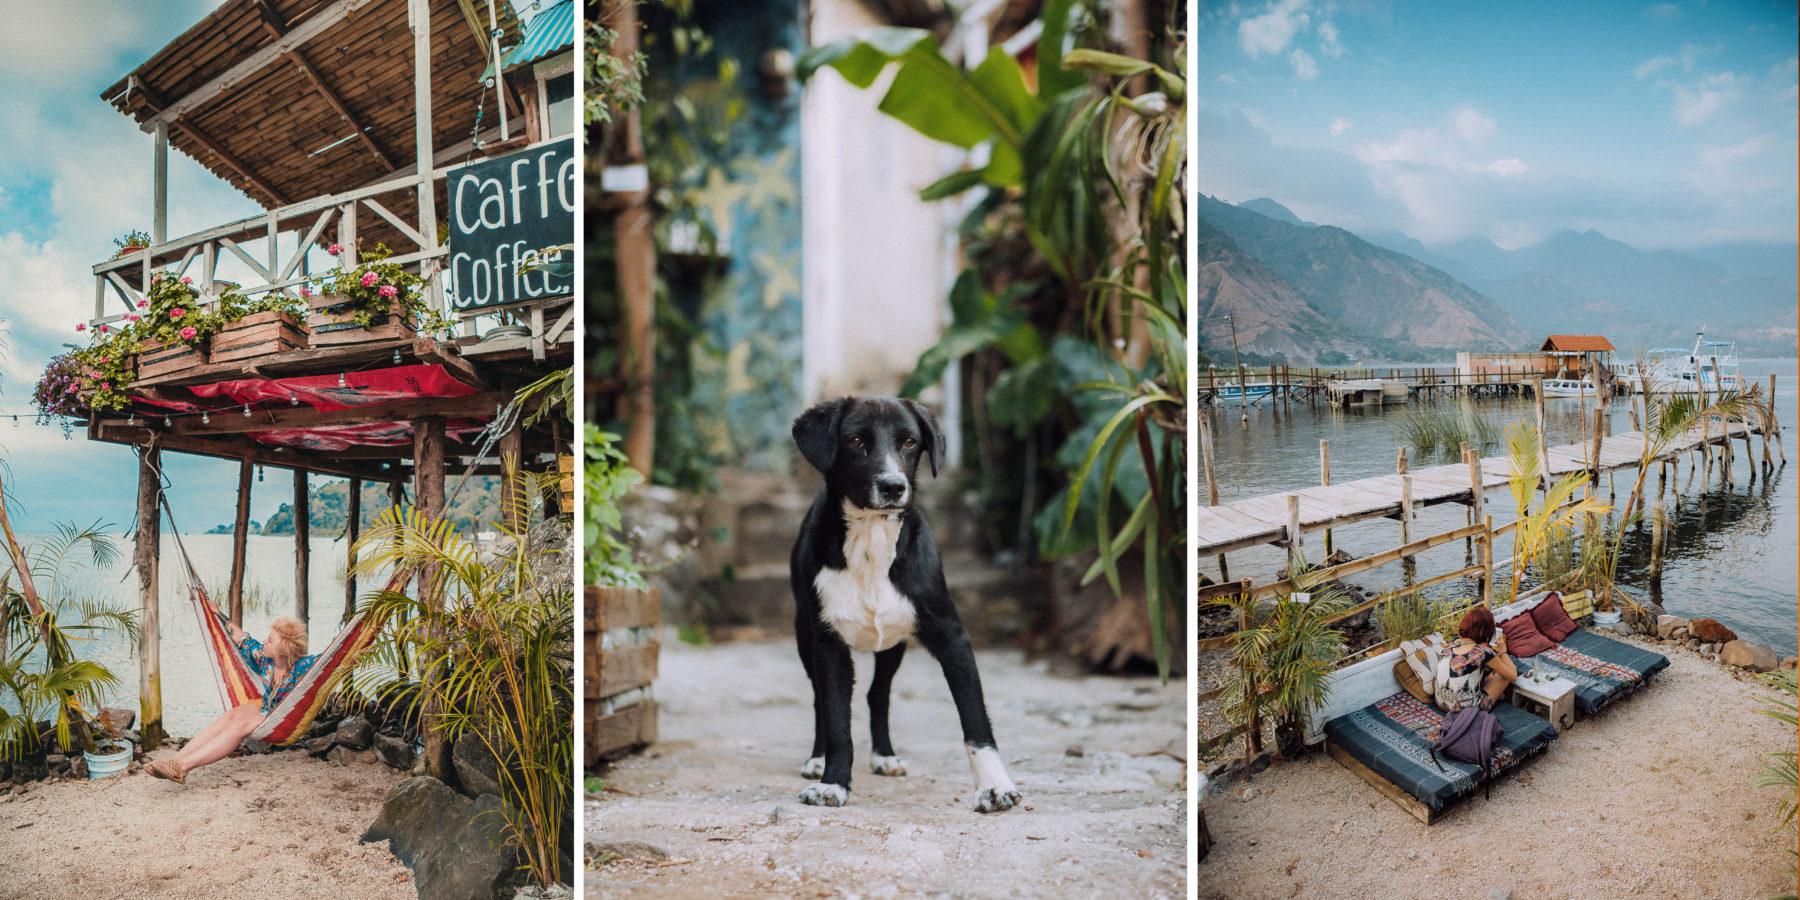 guatemala lake atitlan lago central america most beautiful lake in the world blue water sunny day street dogs puppie deck san juan la laguna